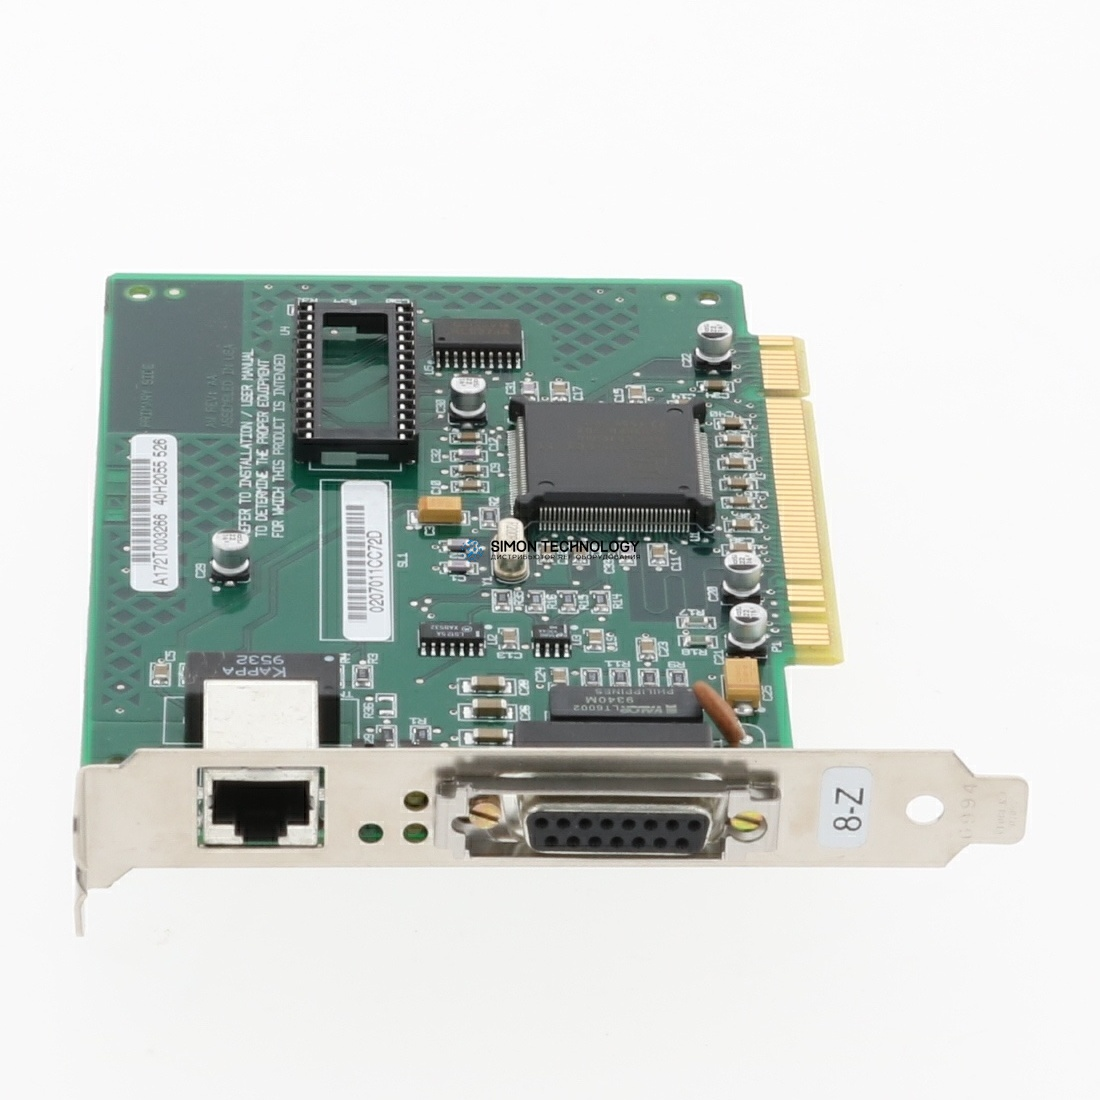 Сетевая карта IBM Ethernet adapter PCI (11G8130)